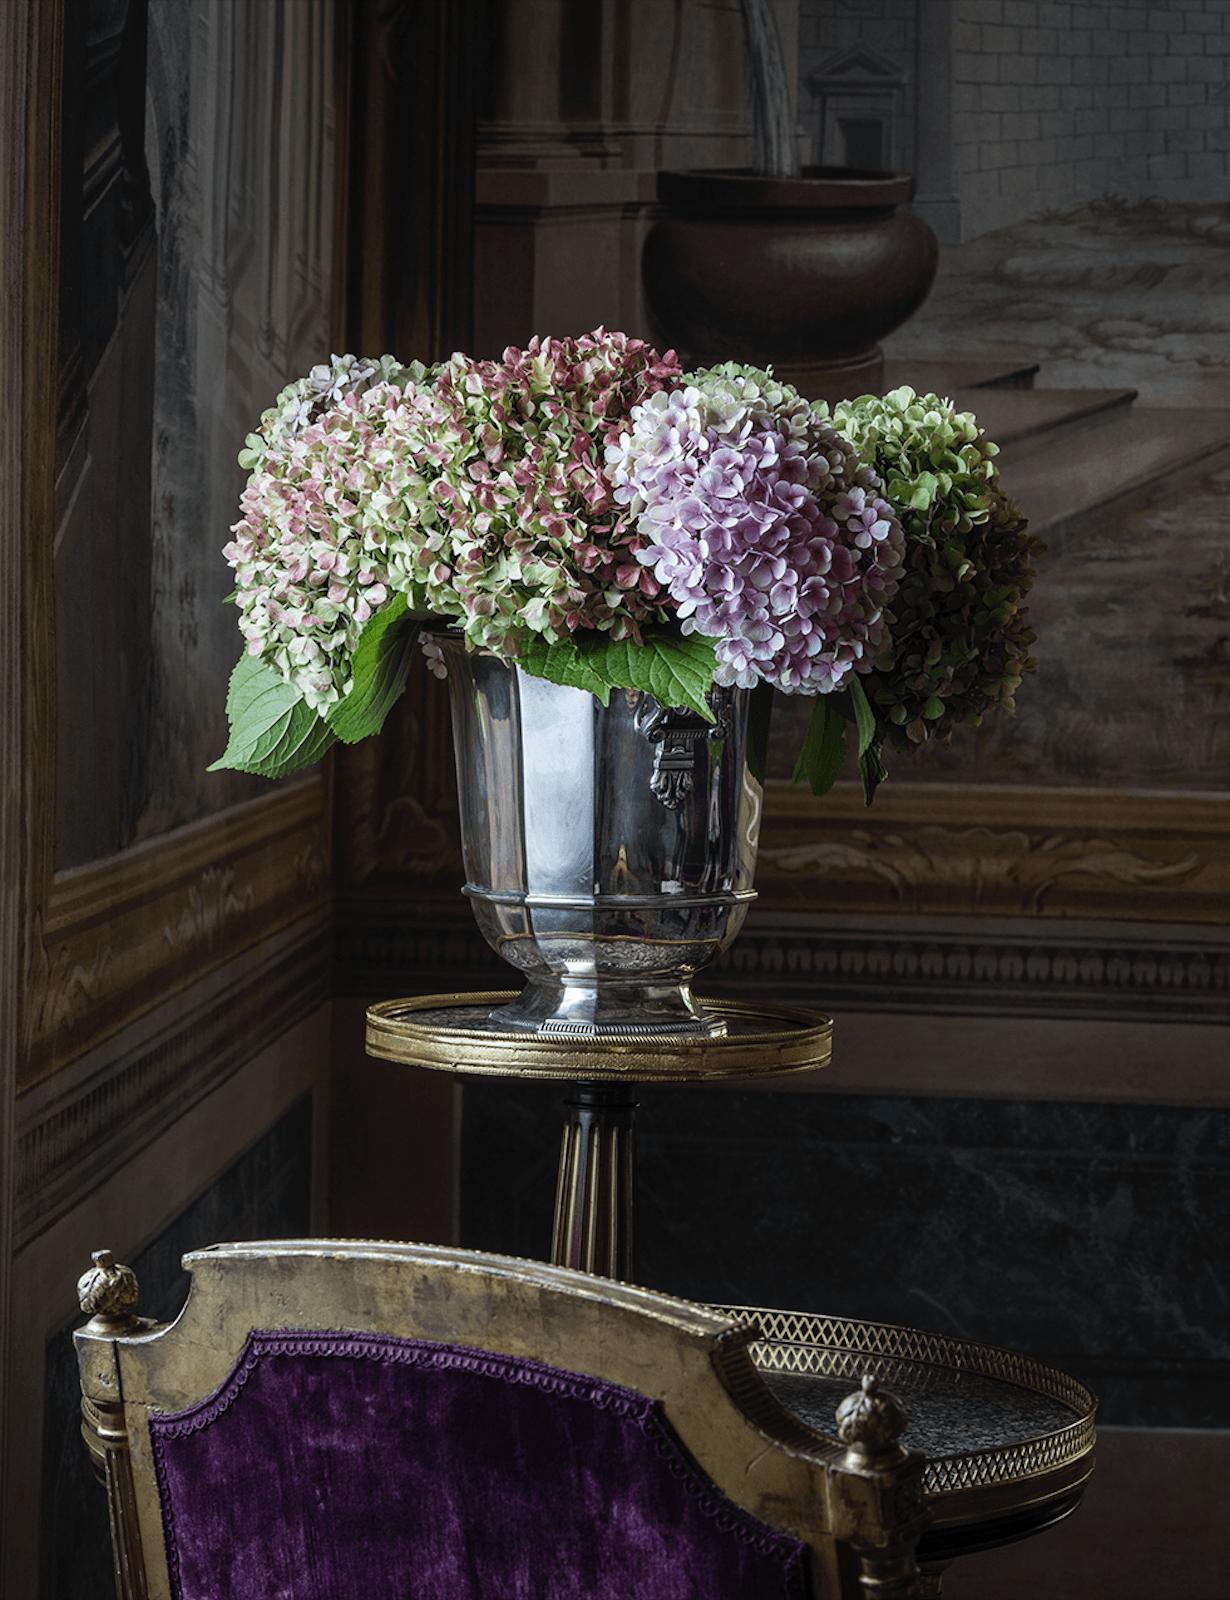 Villa Balbiano luxury property Lake Como Milan Italy classic decor decoration exquisite service best accommodation wedding events vintage silver vase flower design